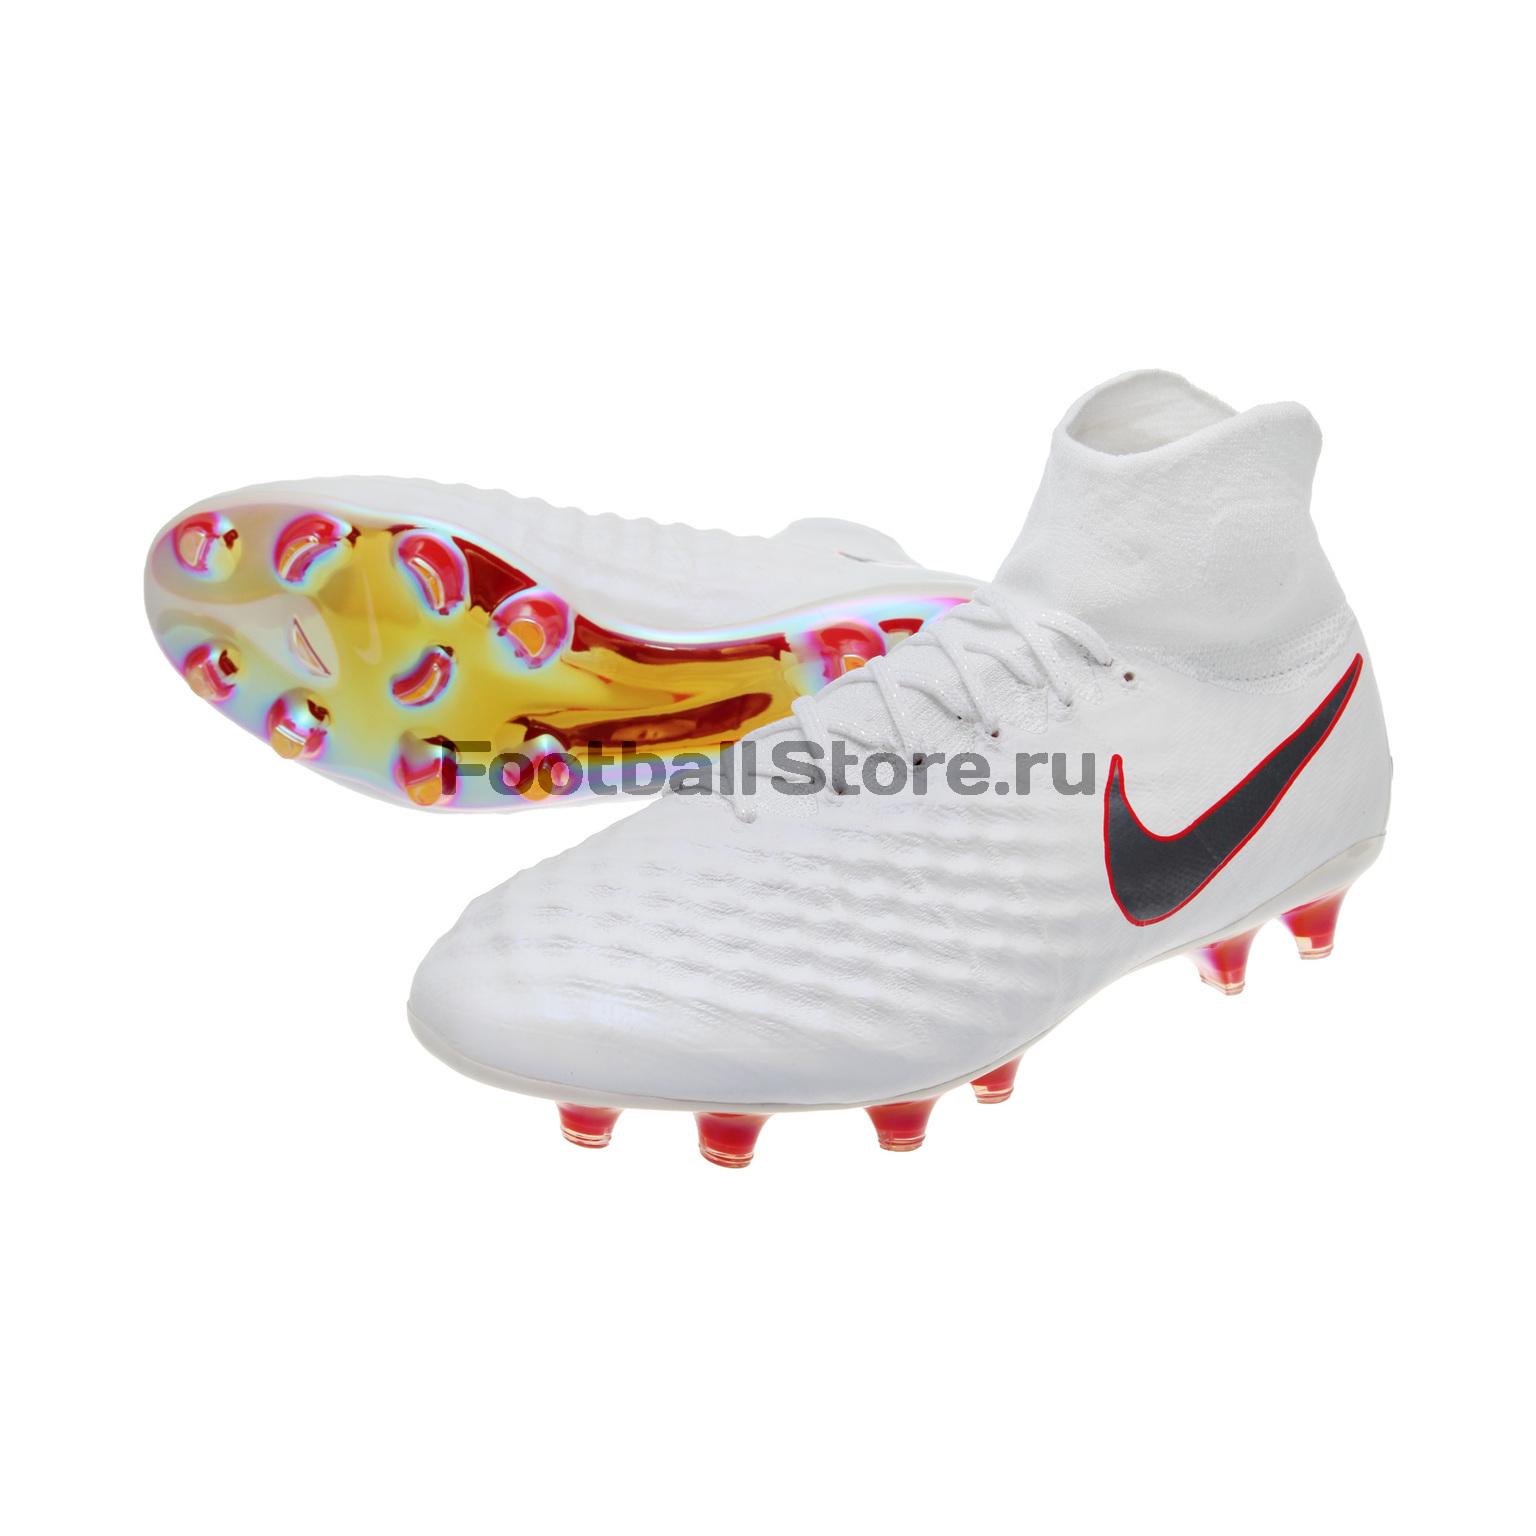 Бутсы Nike Magista Obra 2 Elite DF FG AH7301-107 бутсы nike jr obra 2 club fg ah7314 107